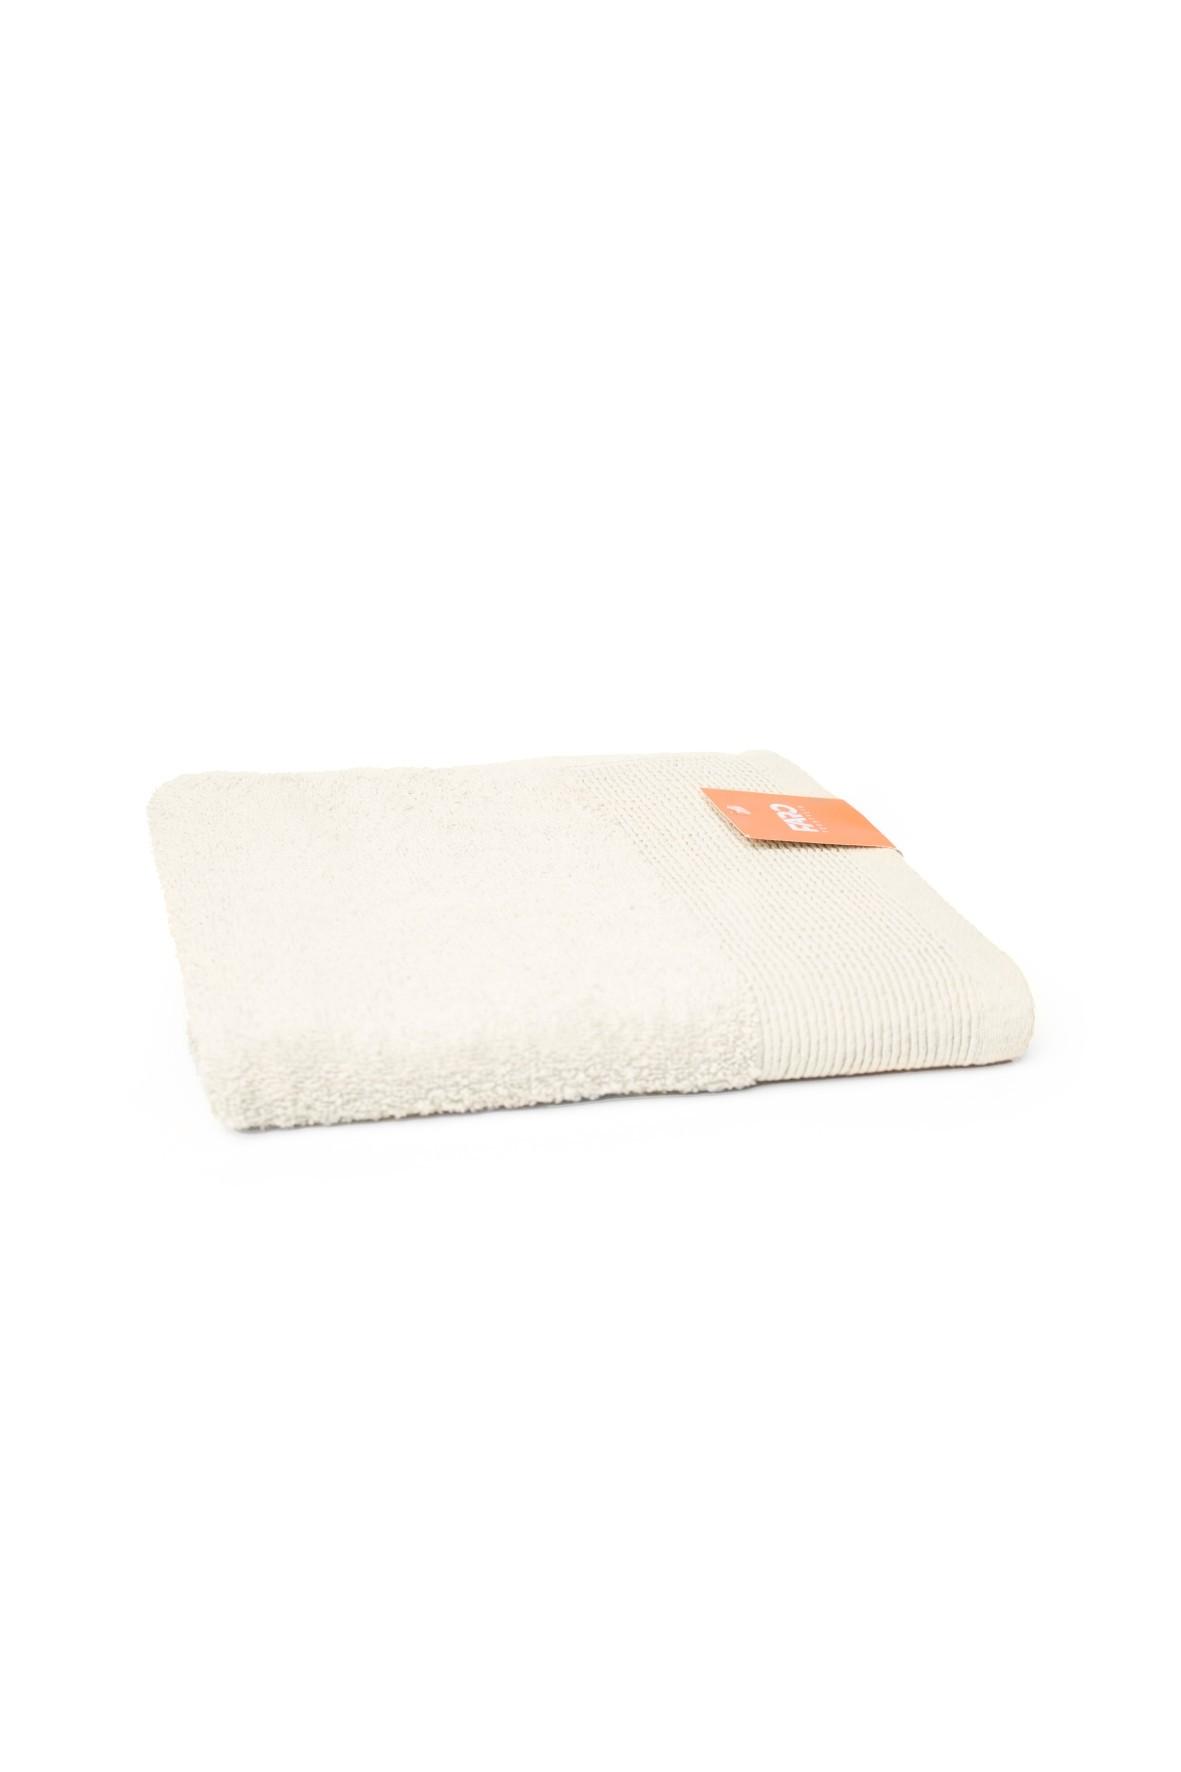 Ręcznik Aqua Frotte w kolorze ecri 70x140 cm